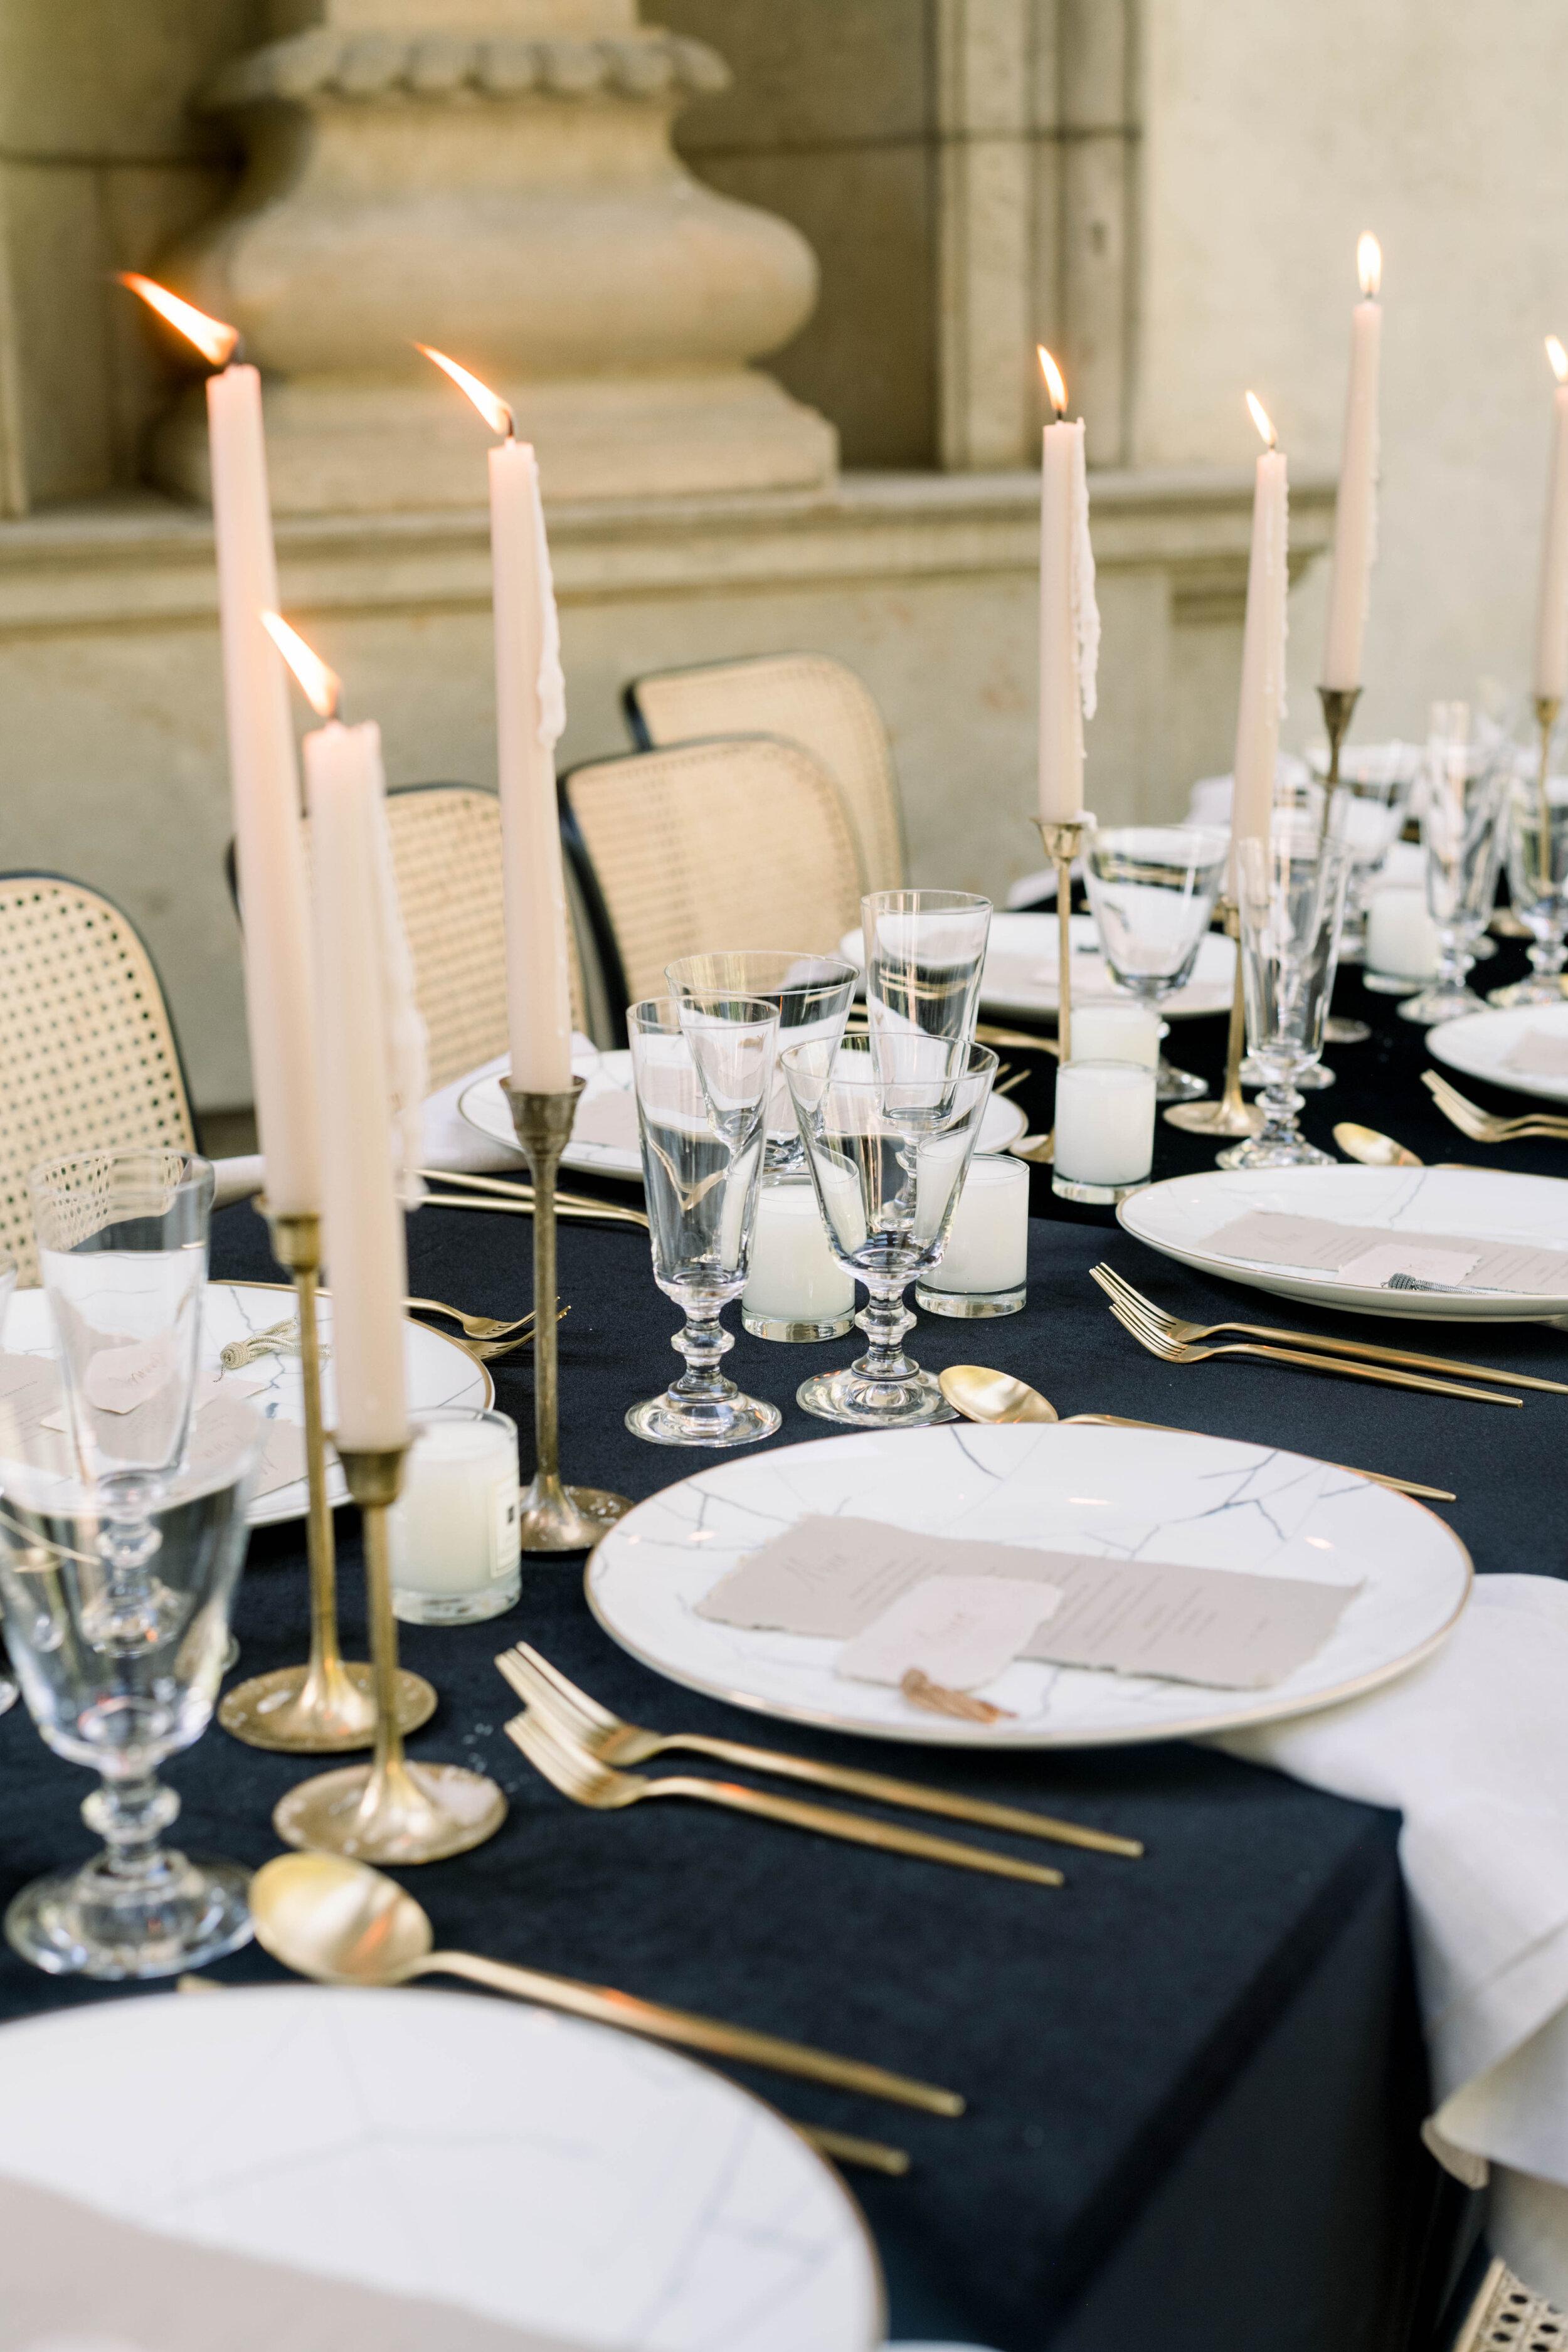 fine art wedding, Atlanta wedding, swan house wedding, modern wedding, rolls Royce wedding, swan house, high neck wedding dress, white tux, black tablecloth, wedding candles